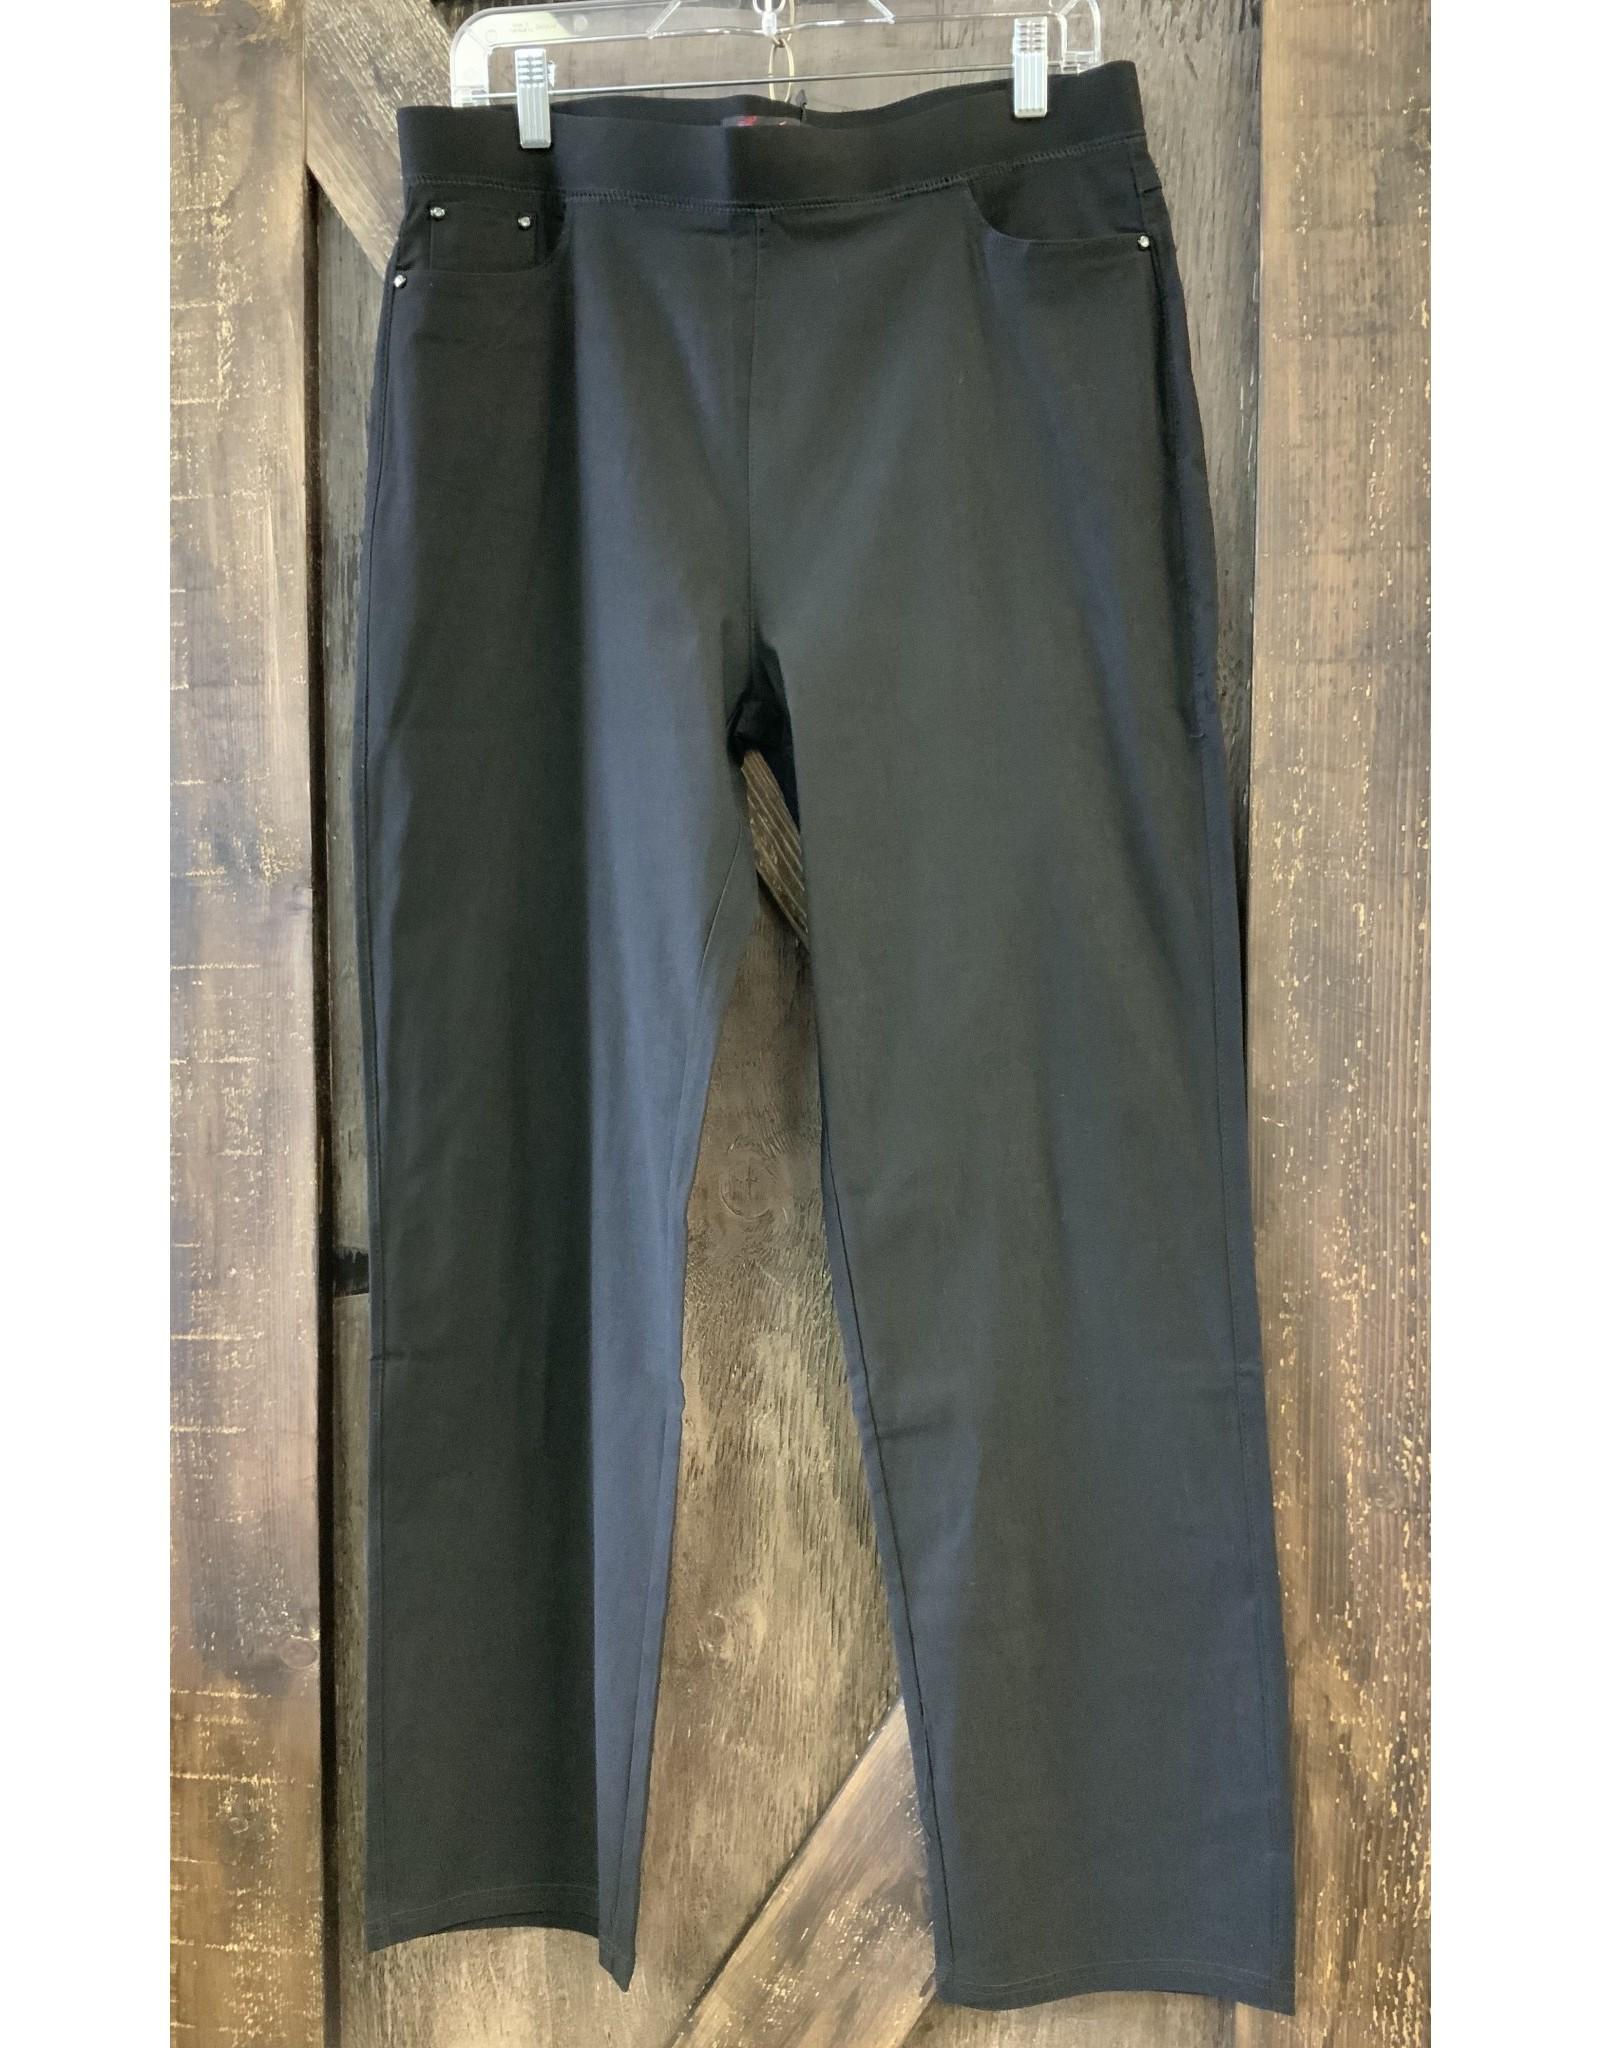 LADIES STRETCH DRESS PANT